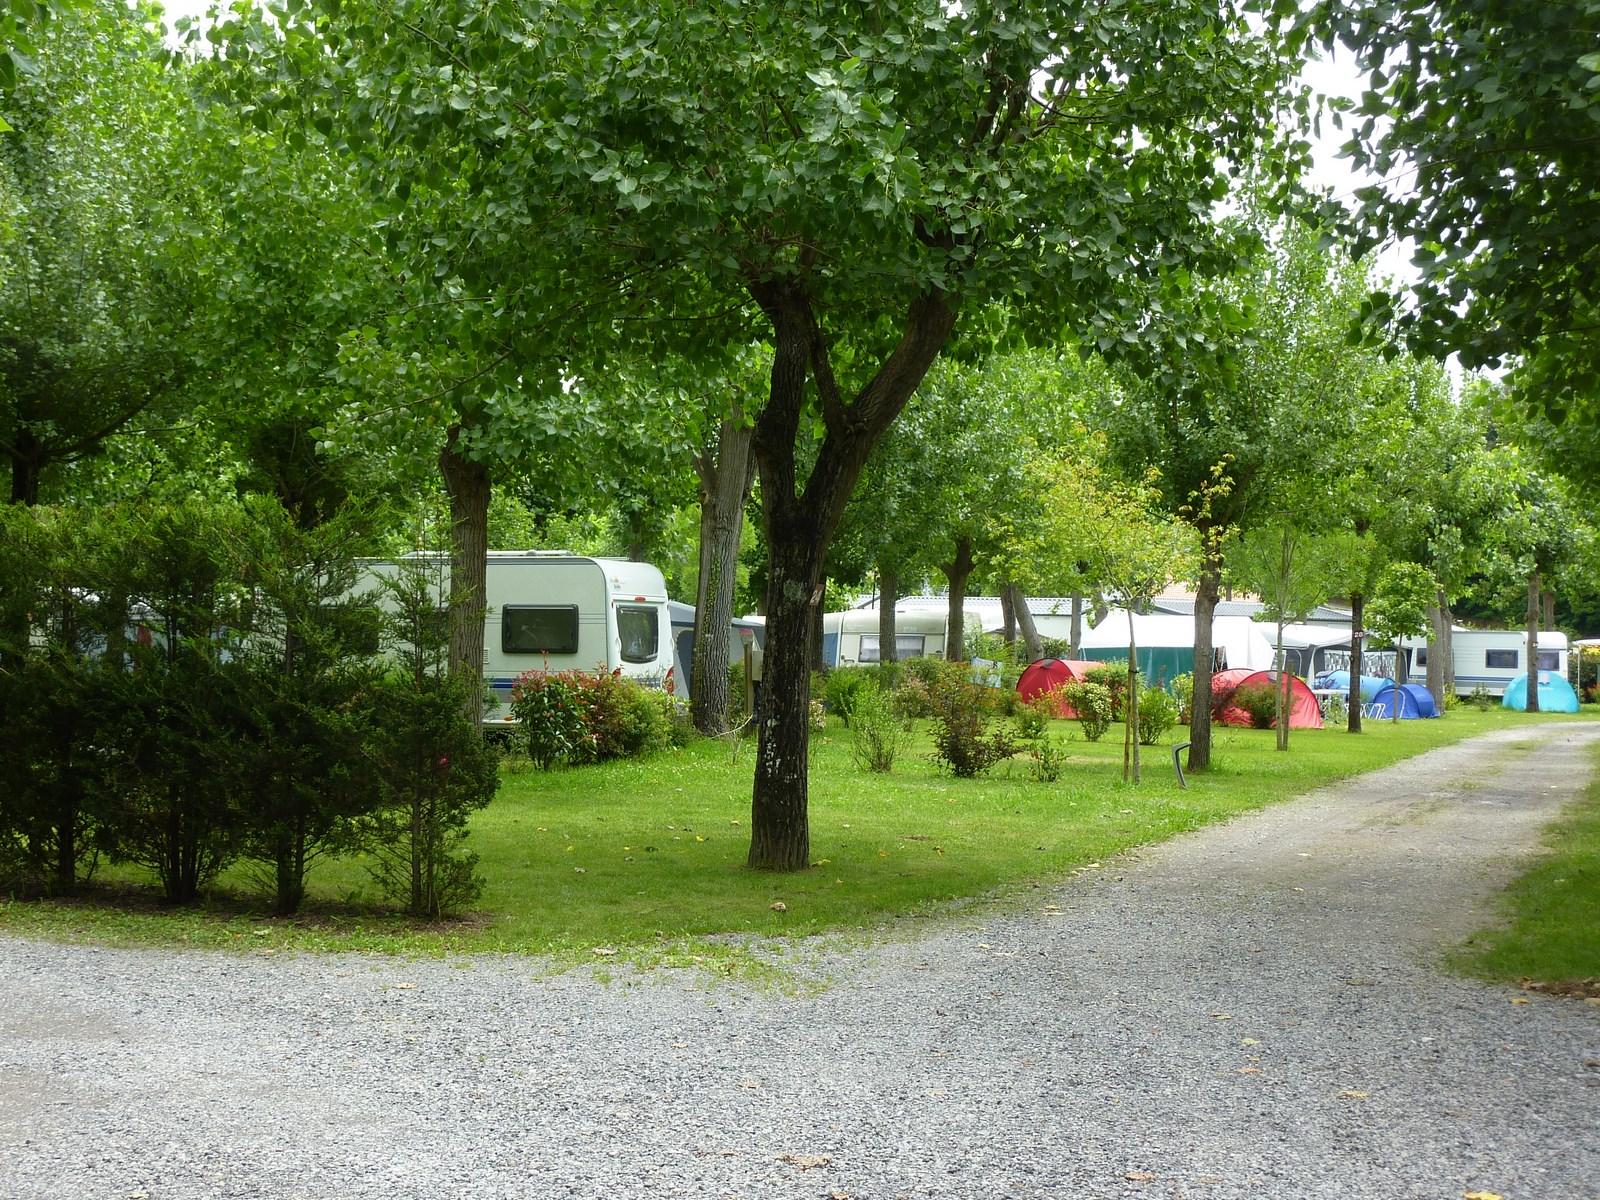 camping-emplacement-caravane-tente-campingcar